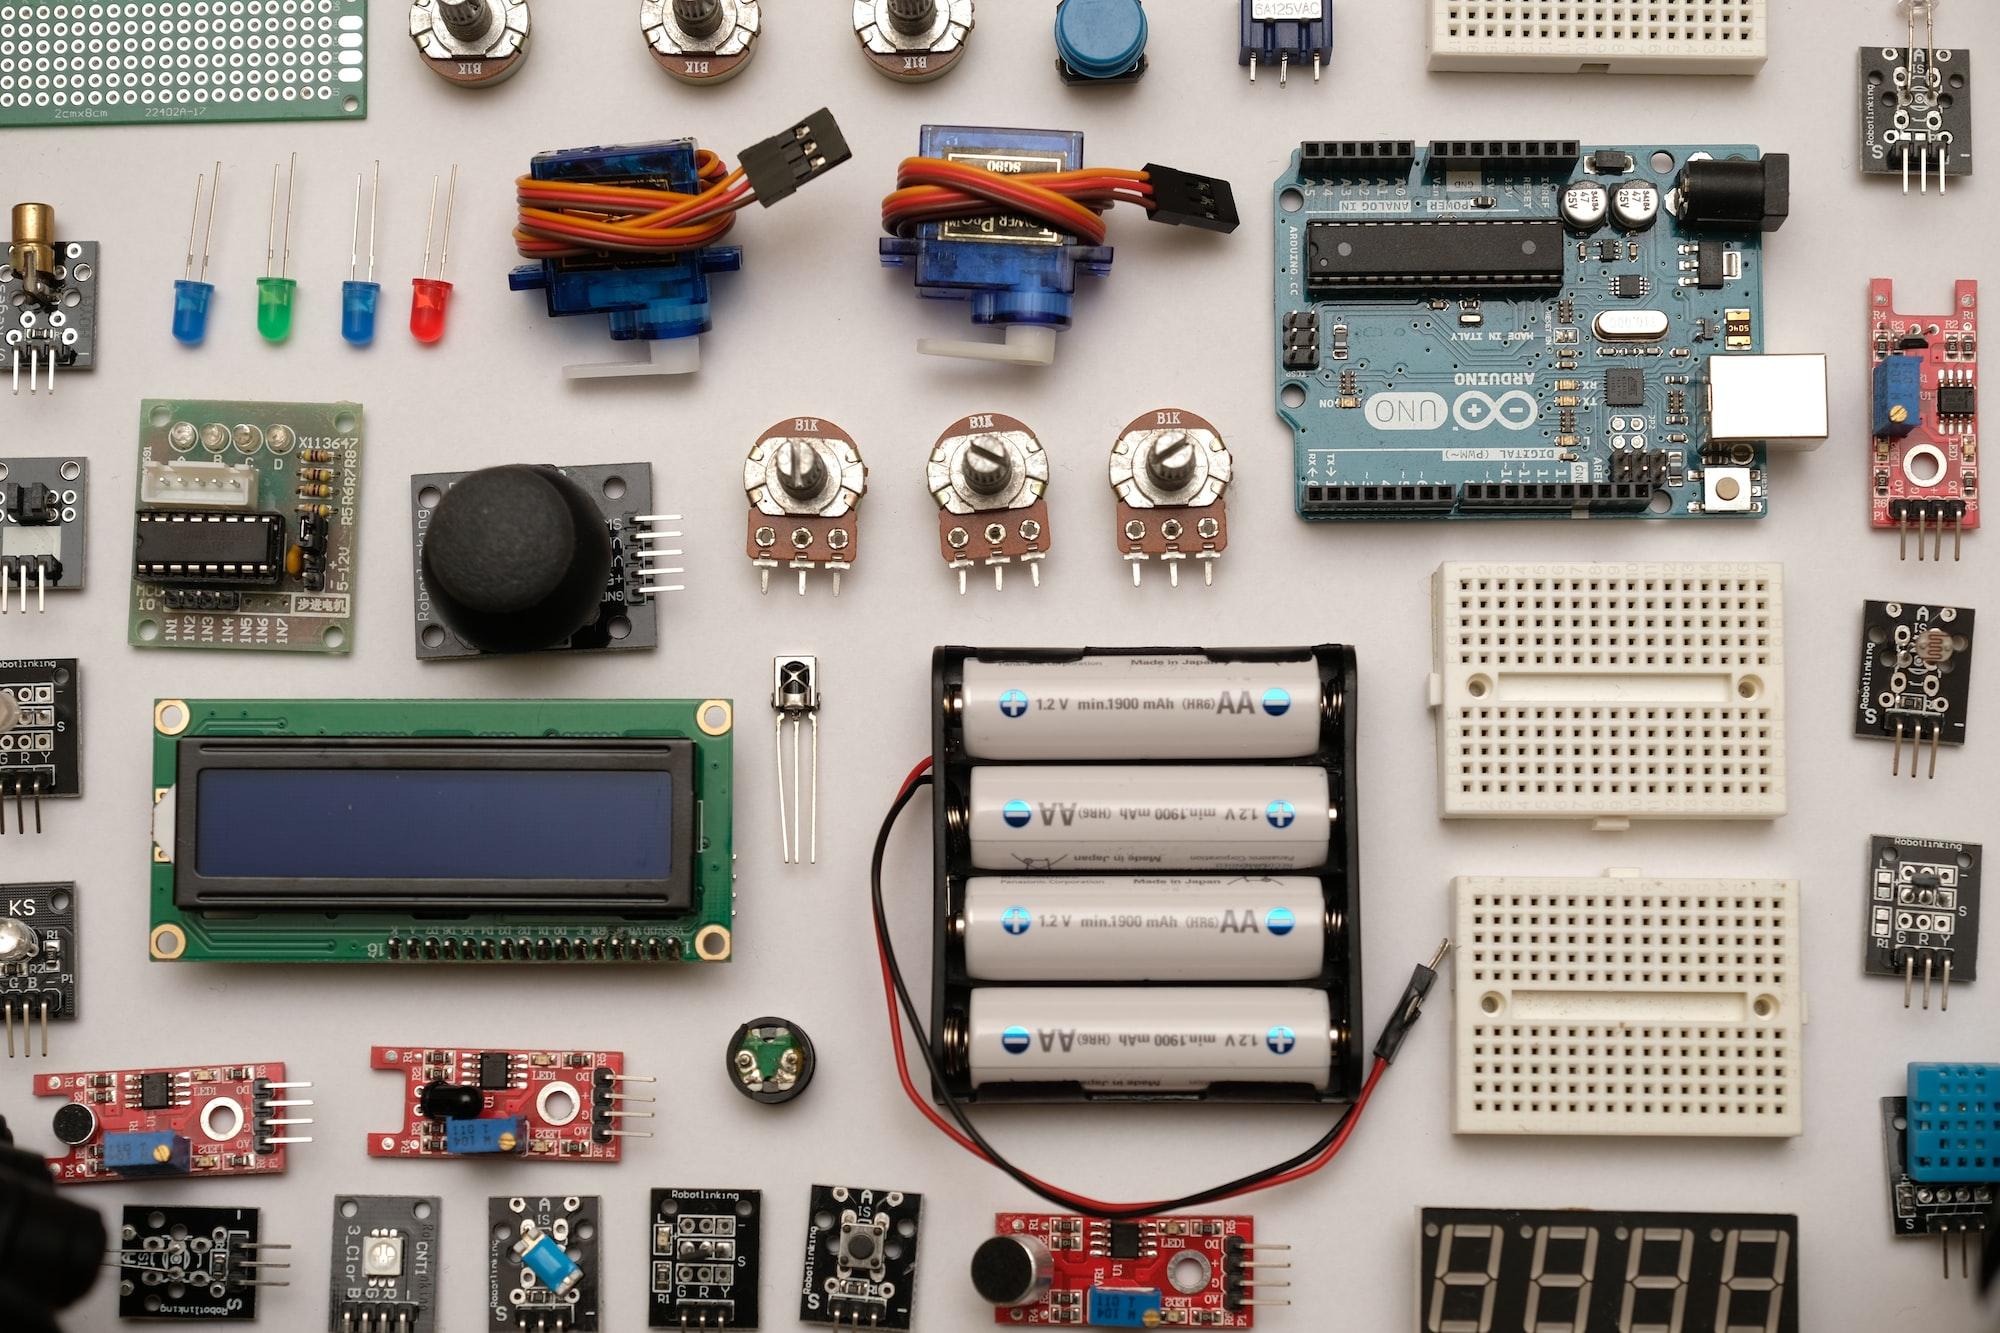 Hlutir - An open-source IoT solution